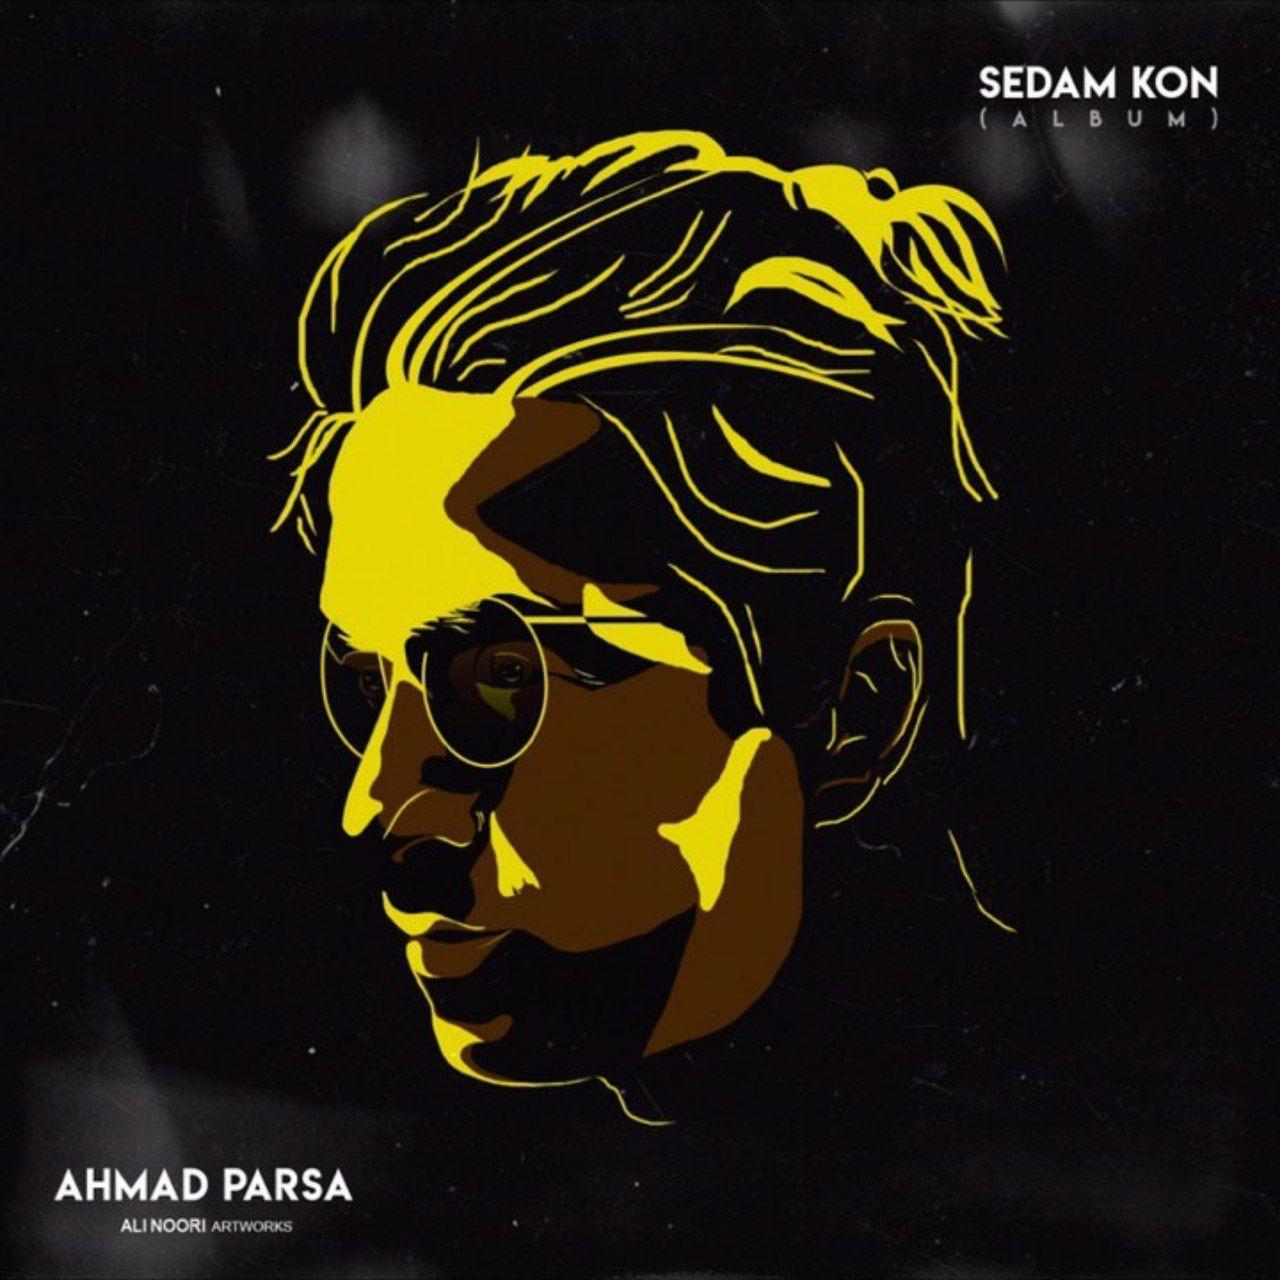 Ahmad Parsa – Sedam Kon Album